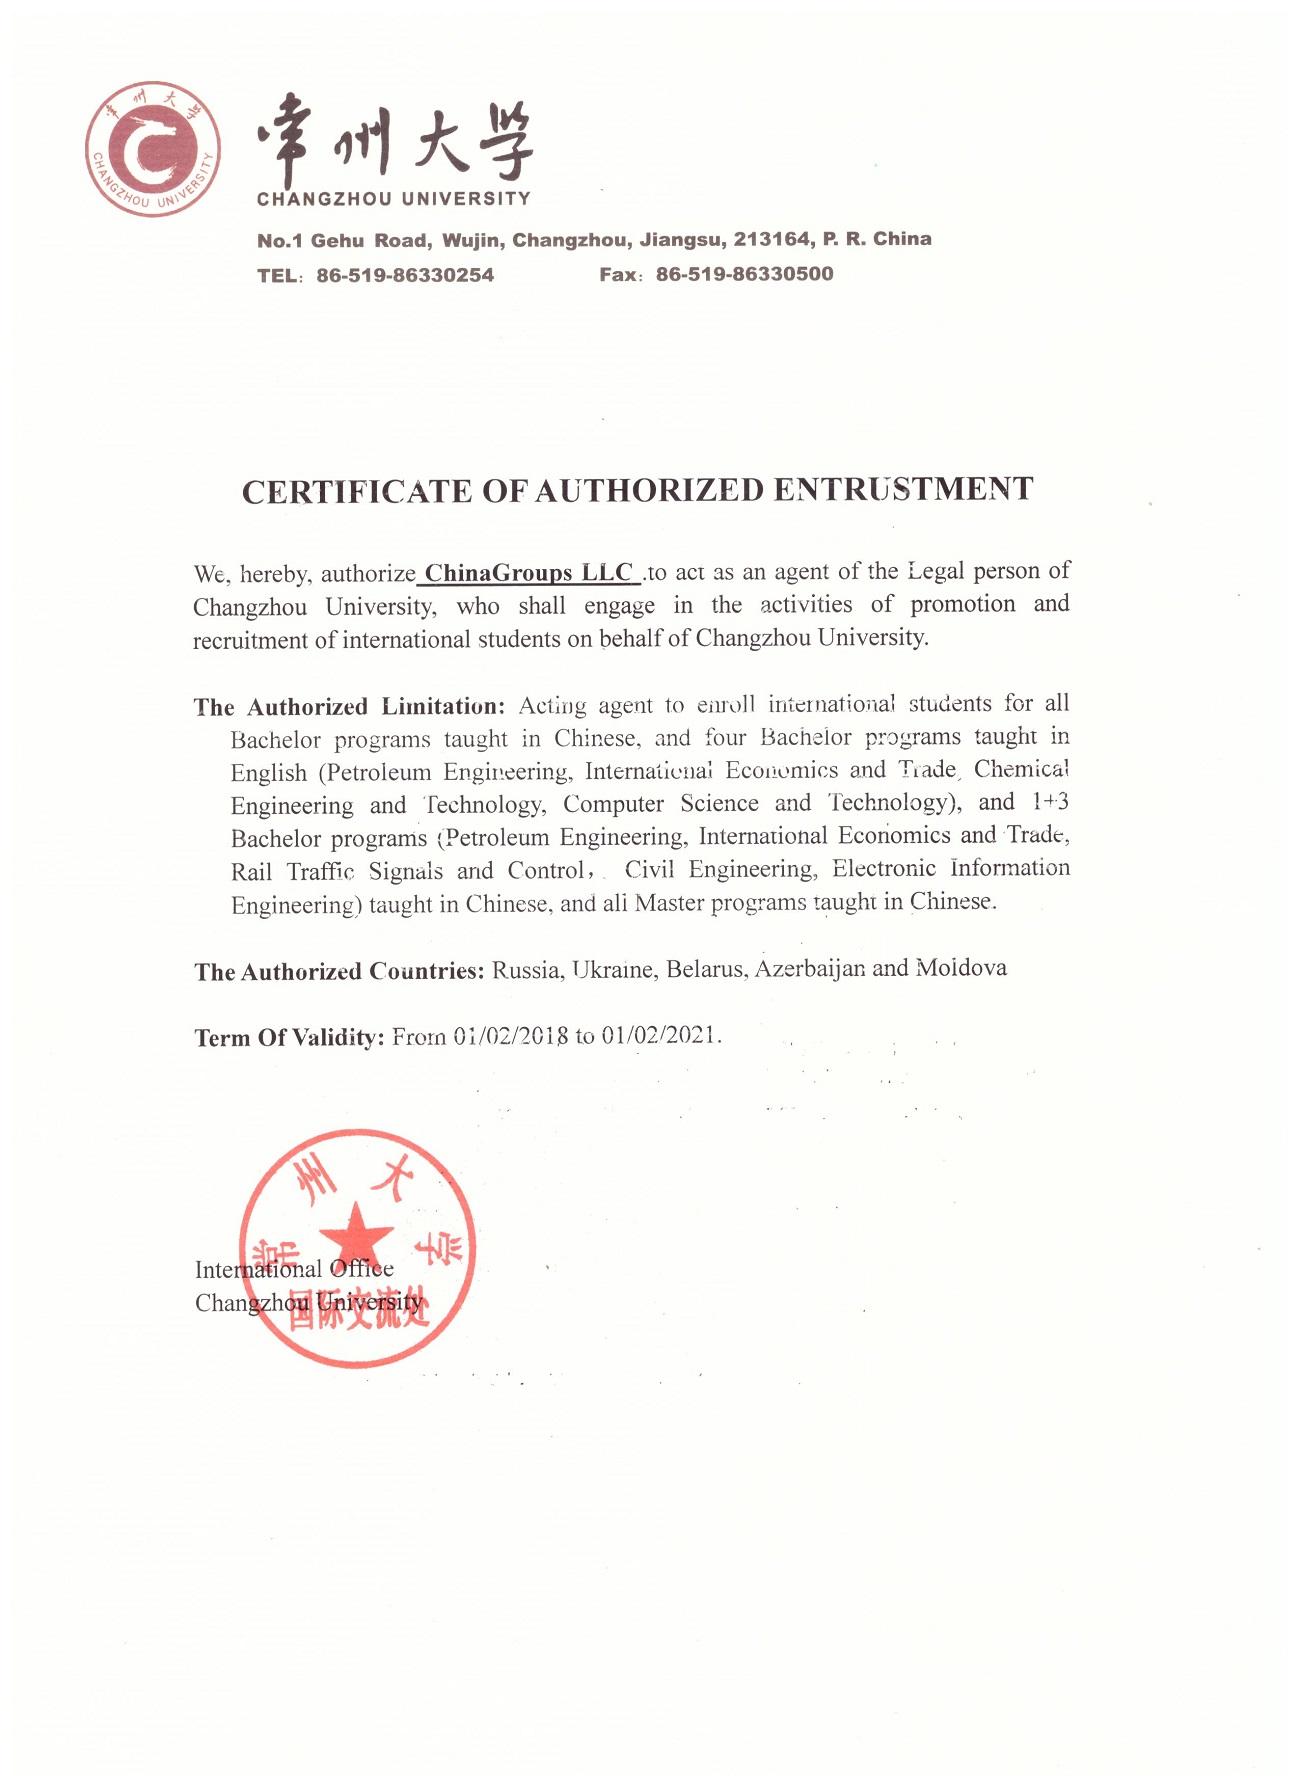 Доверенность Чанчжоу